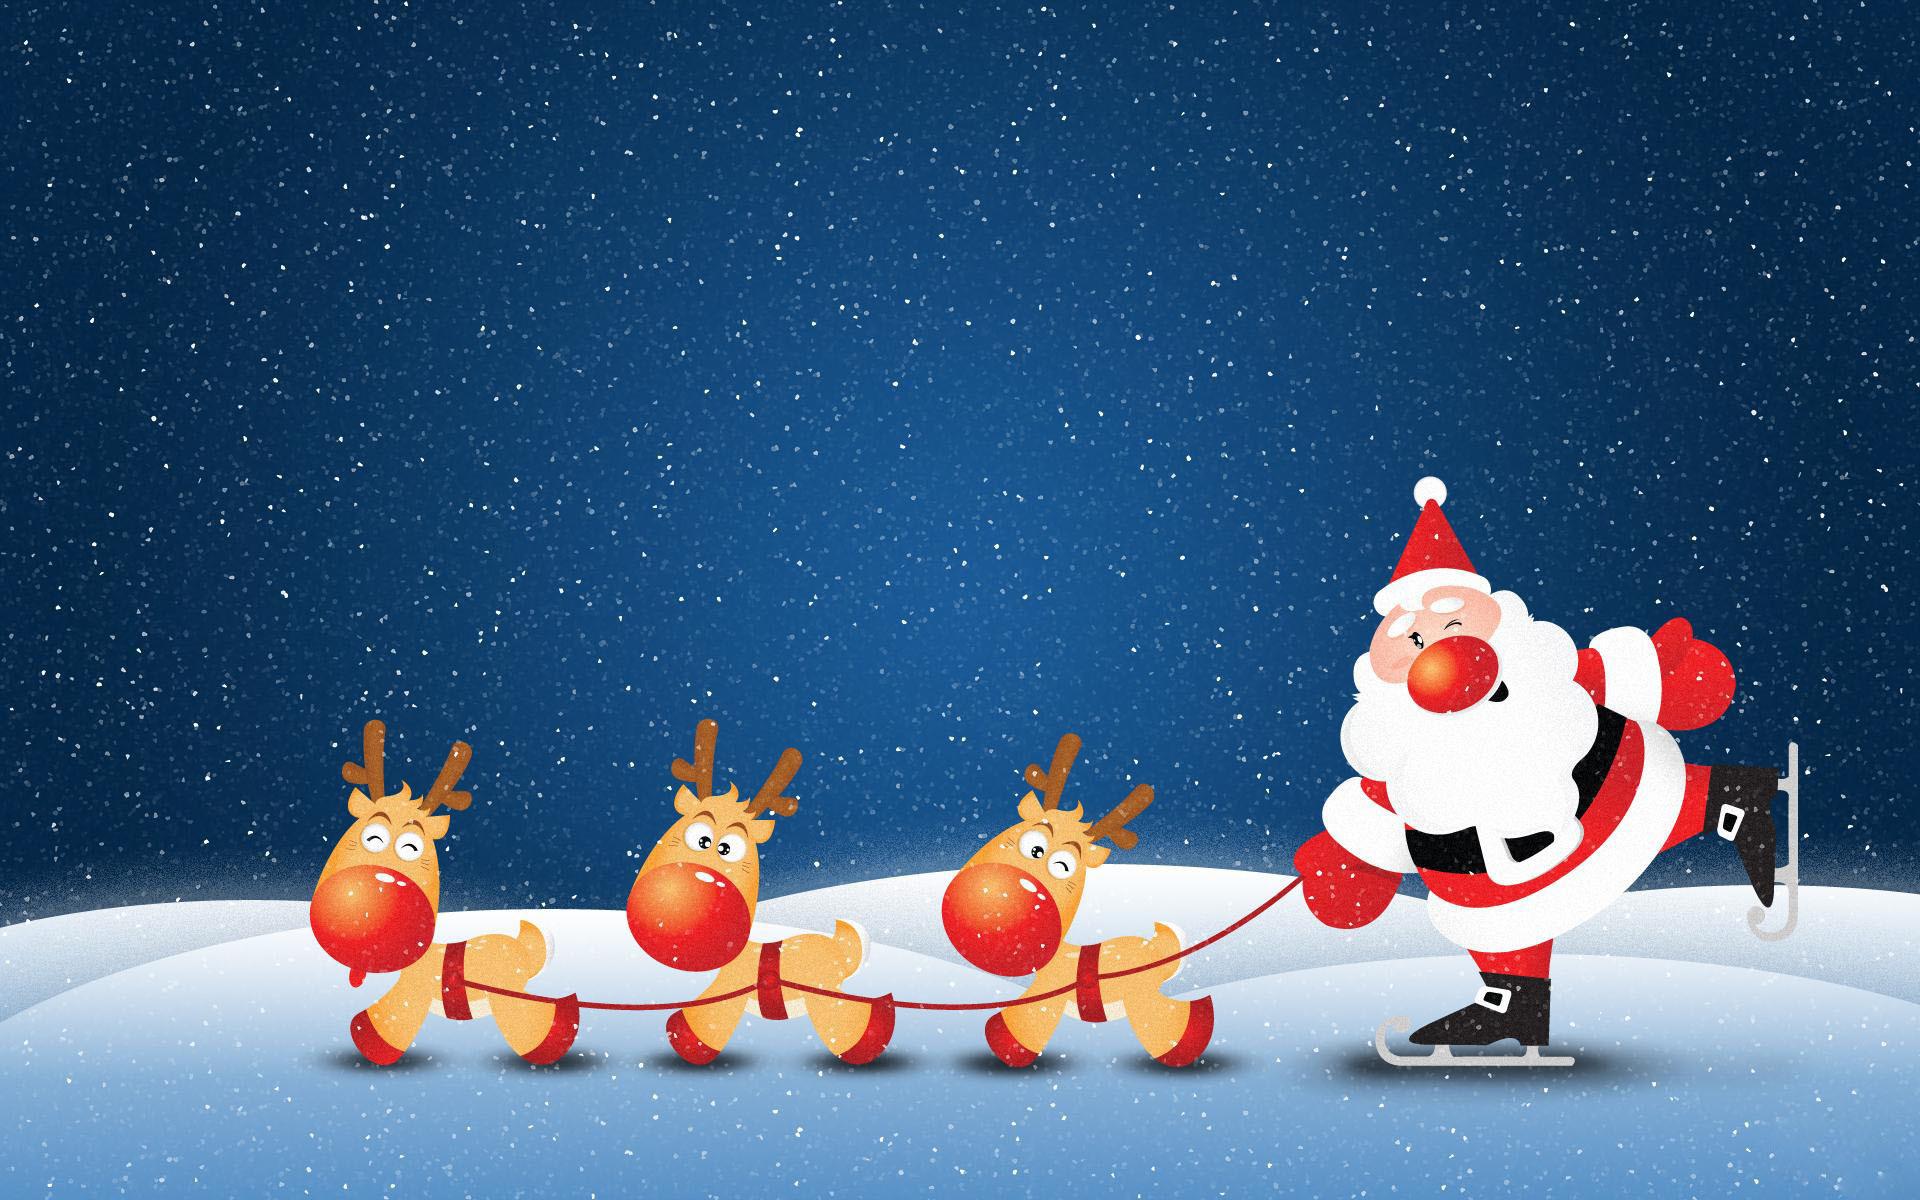 Cute Christmas Desktop Backgrounds 63 Images